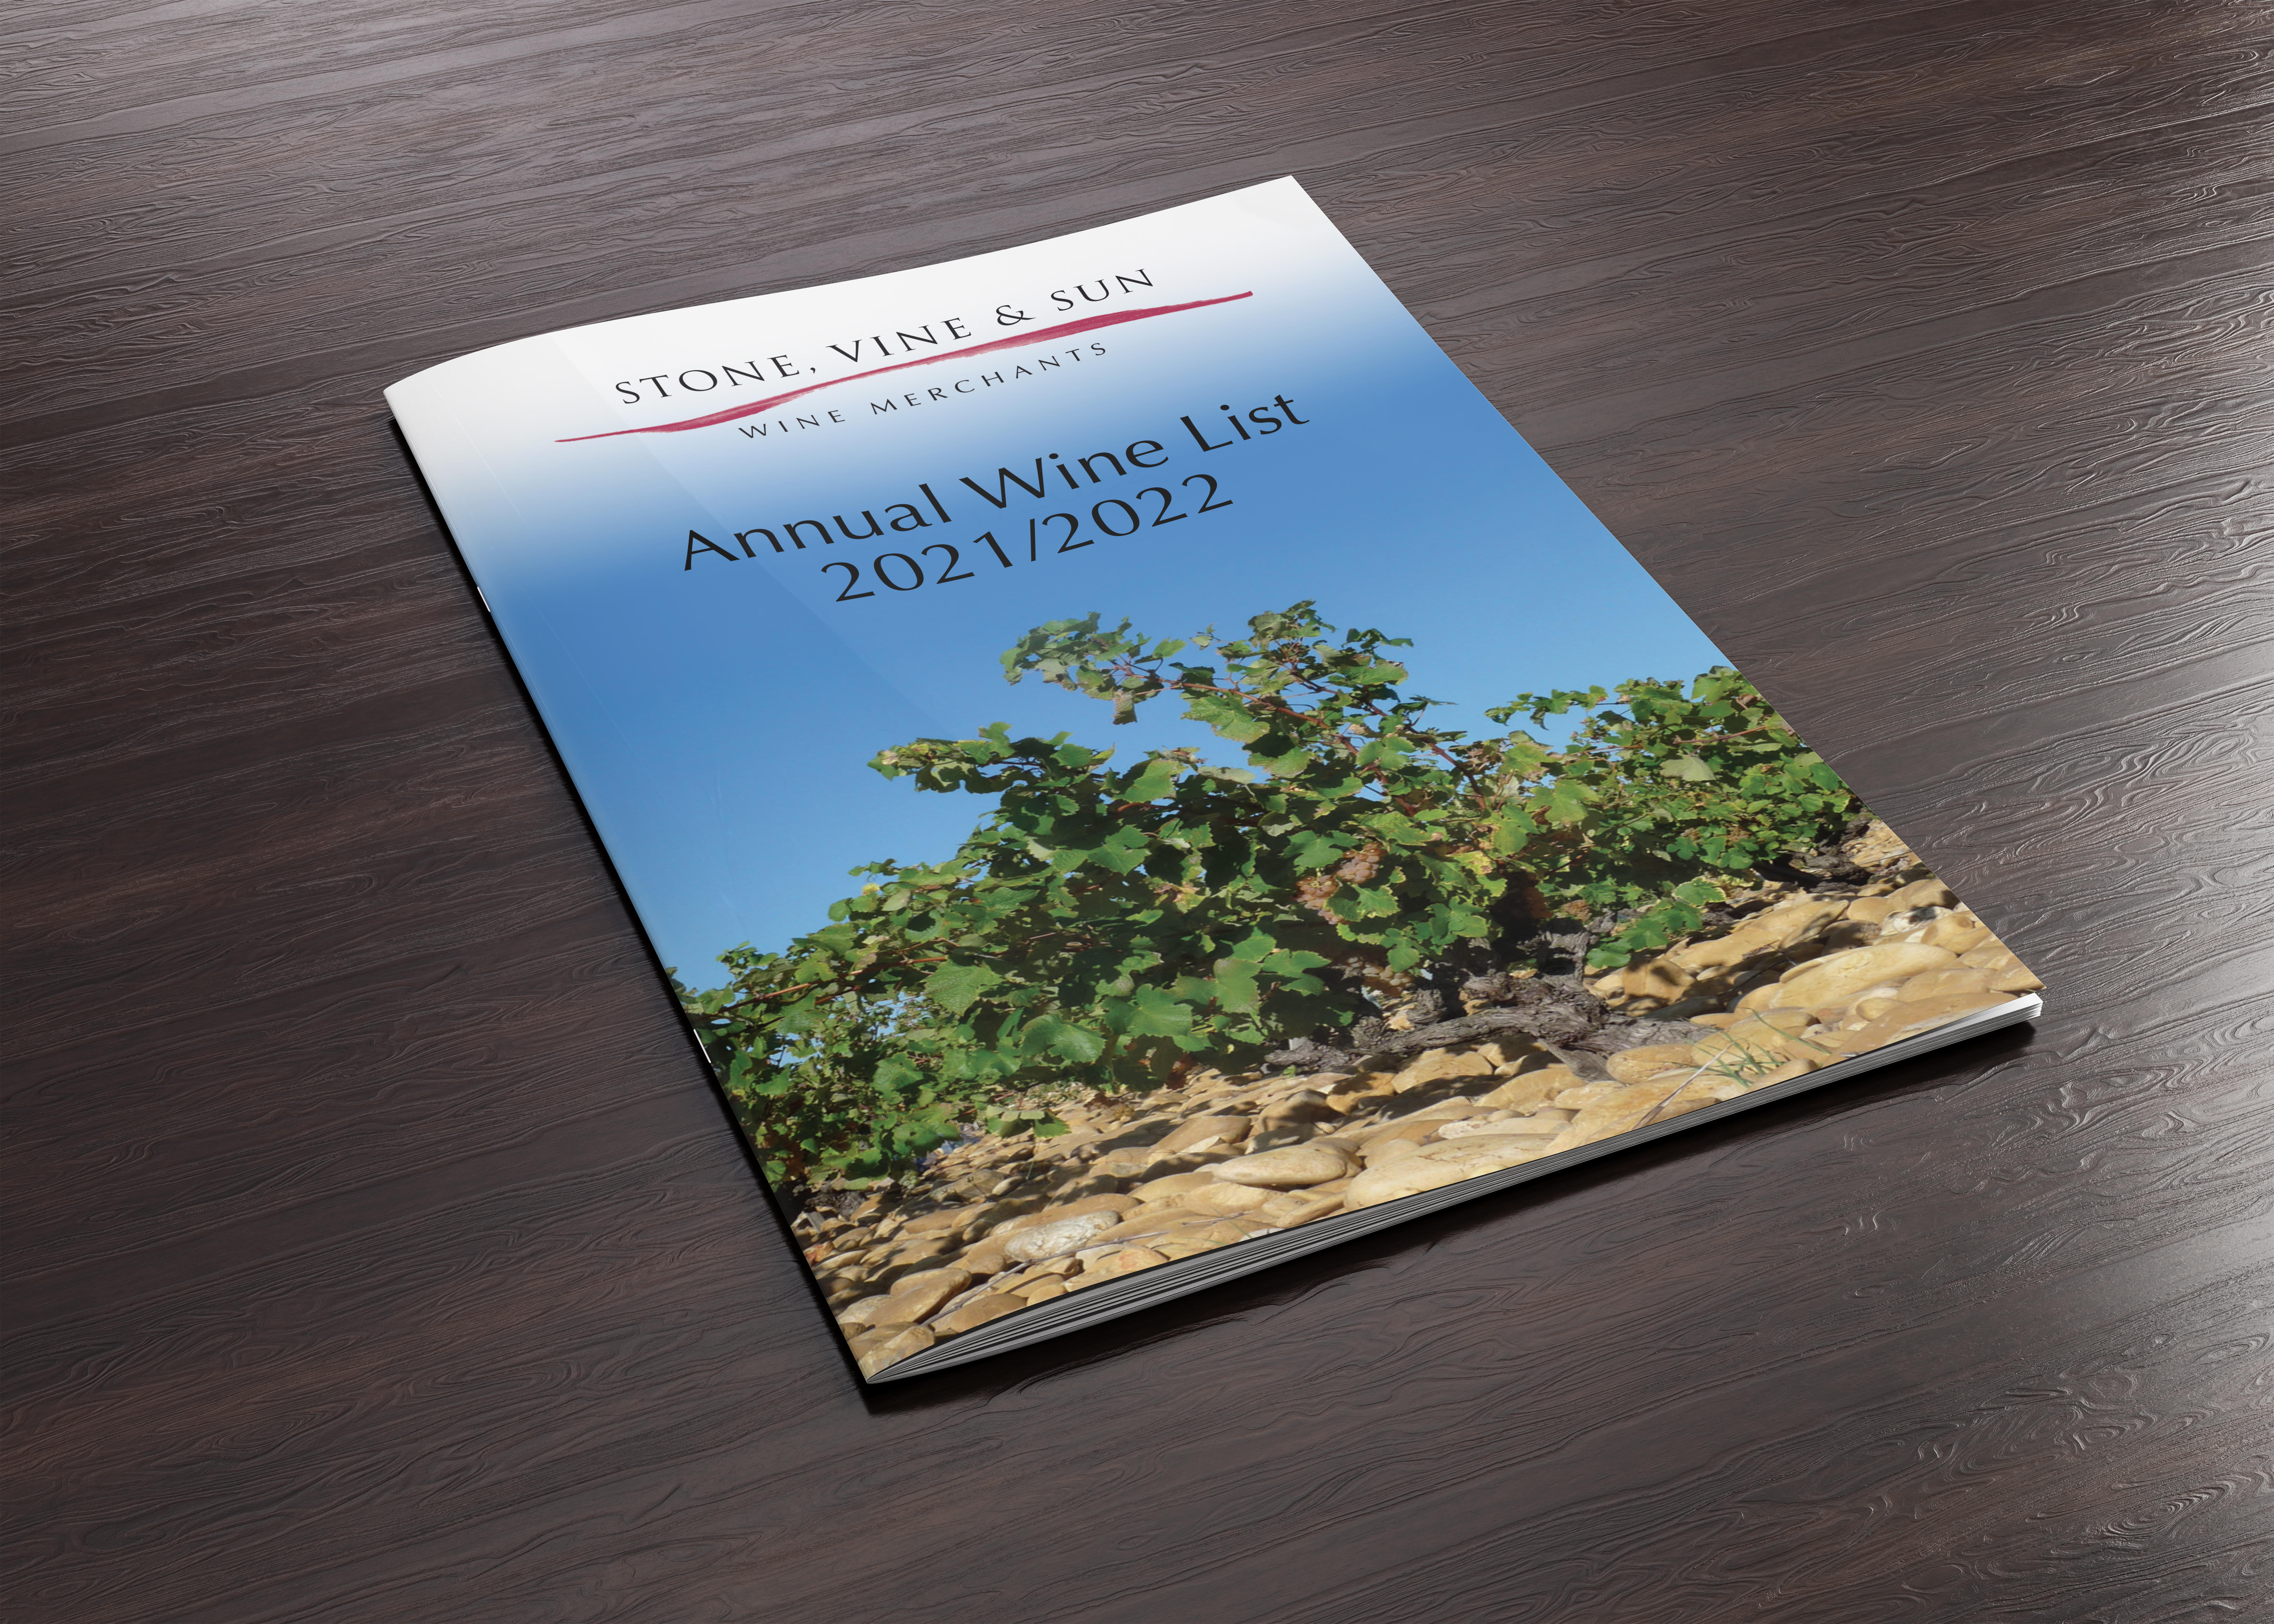 Stone, Vine & Sun Annual Wine List 2021/22